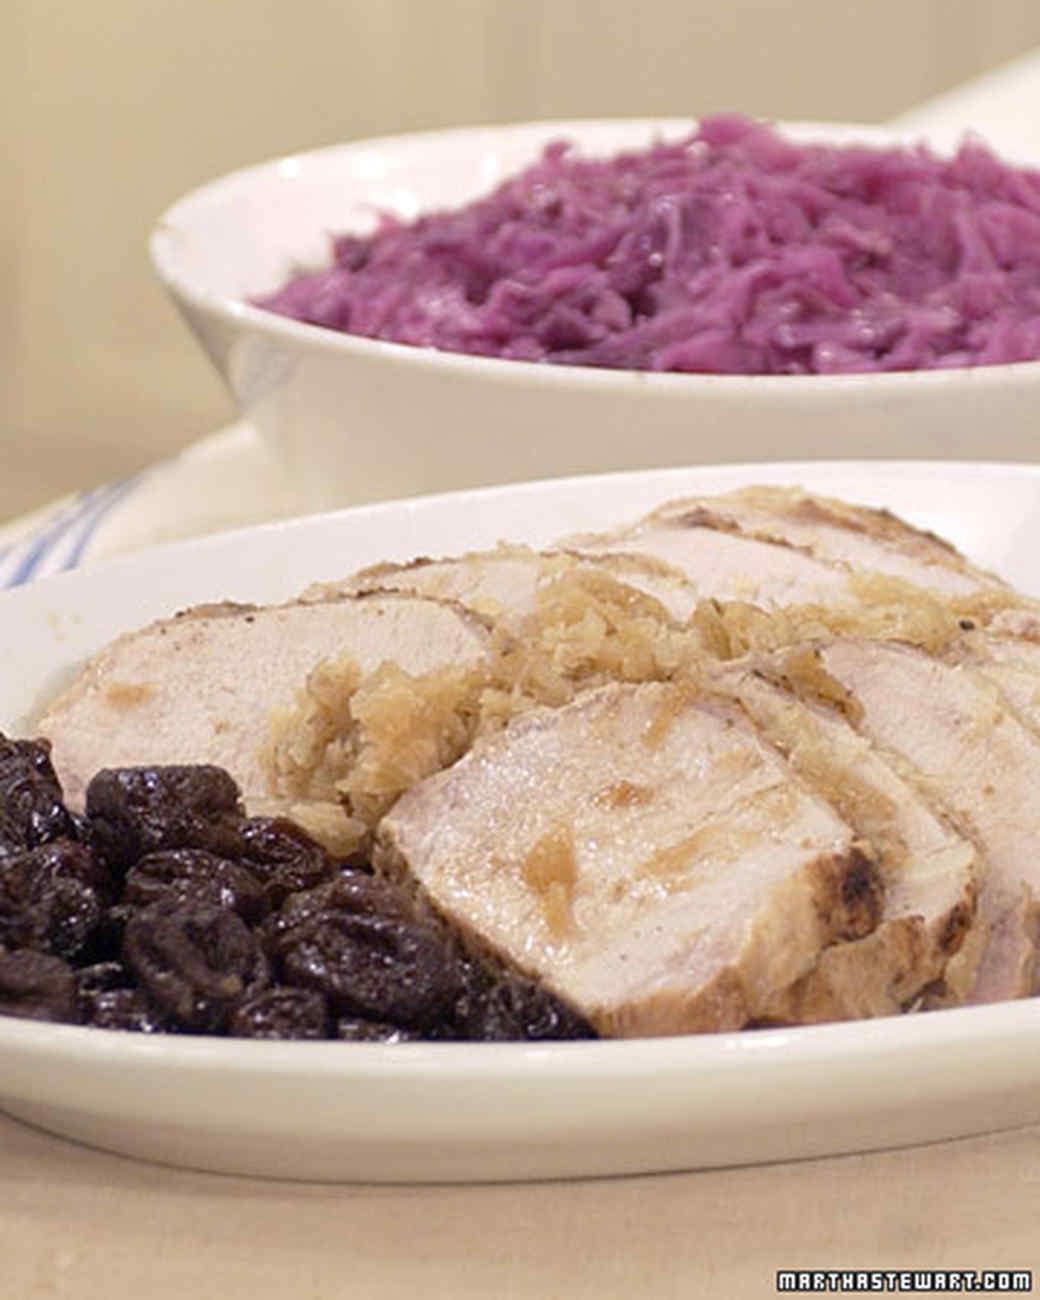 Roast Loin of Pork with Mrs. Kostyra